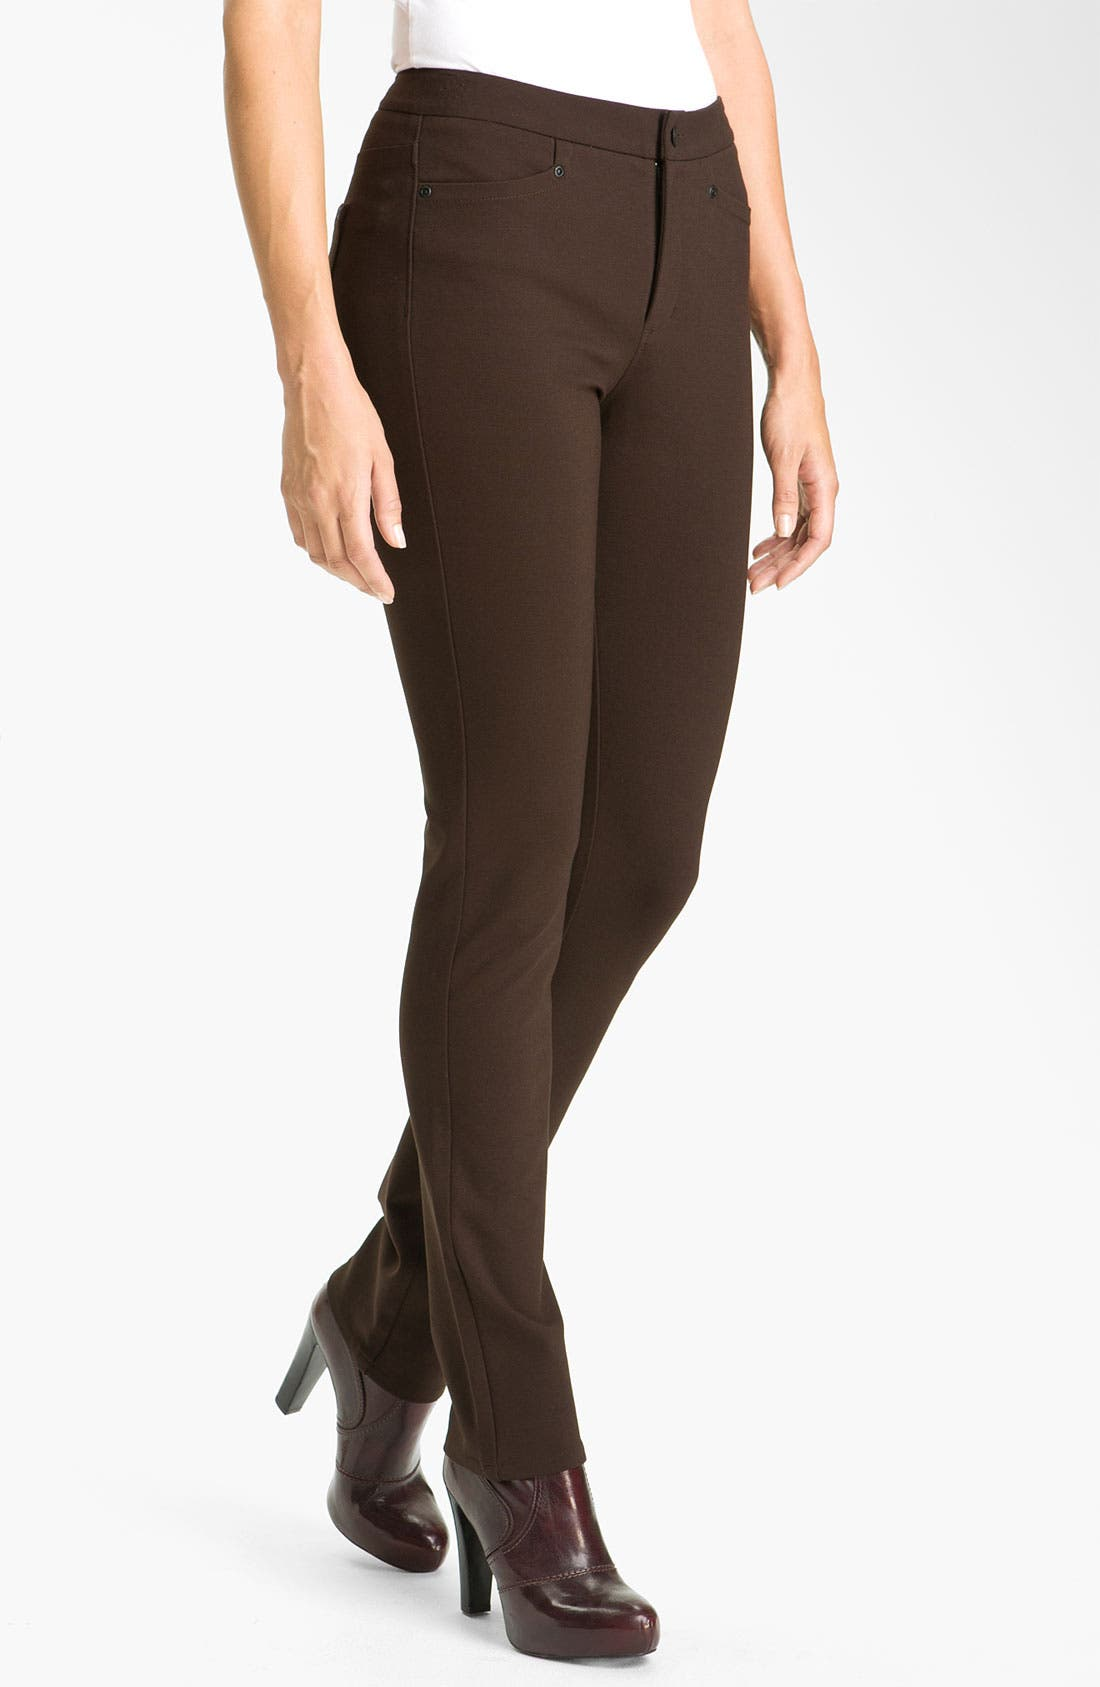 Main Image - NYDJ 'Samantha' Stretch Ponte Knit Pants